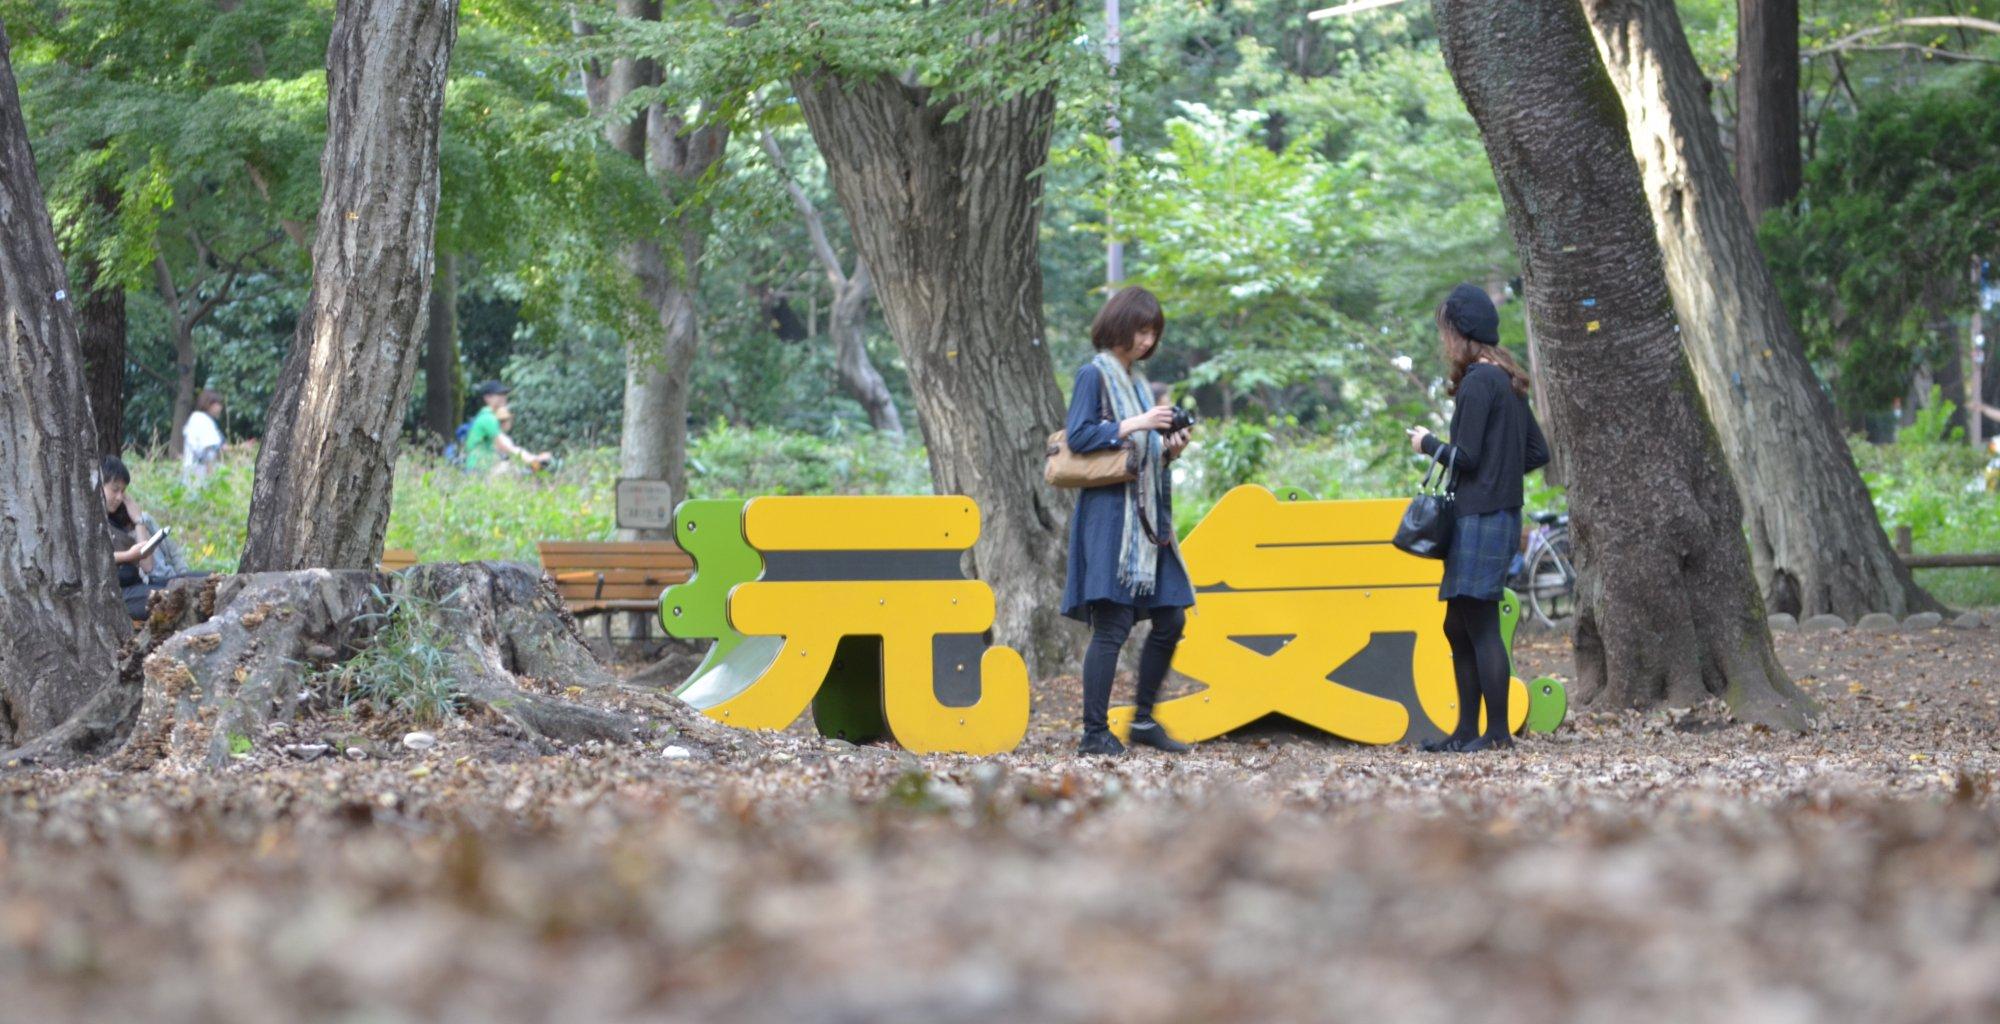 元気(全国都市緑化フェアTOKYO)